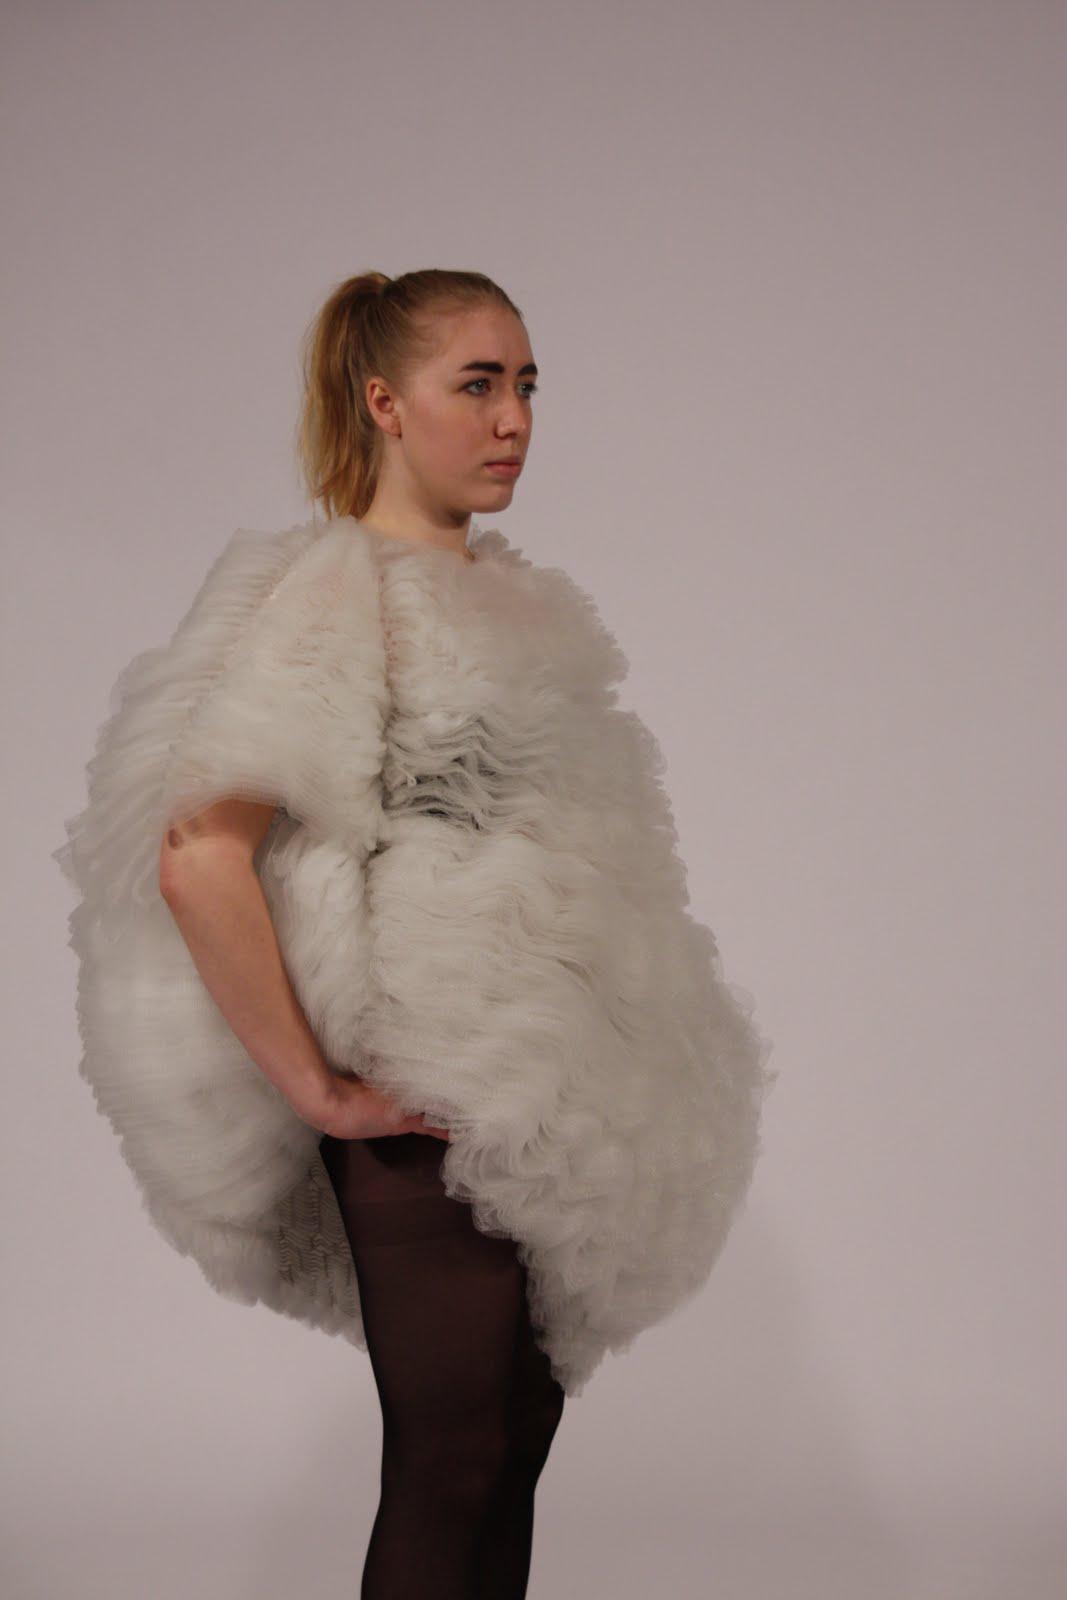 Amber Hards' garment UWE